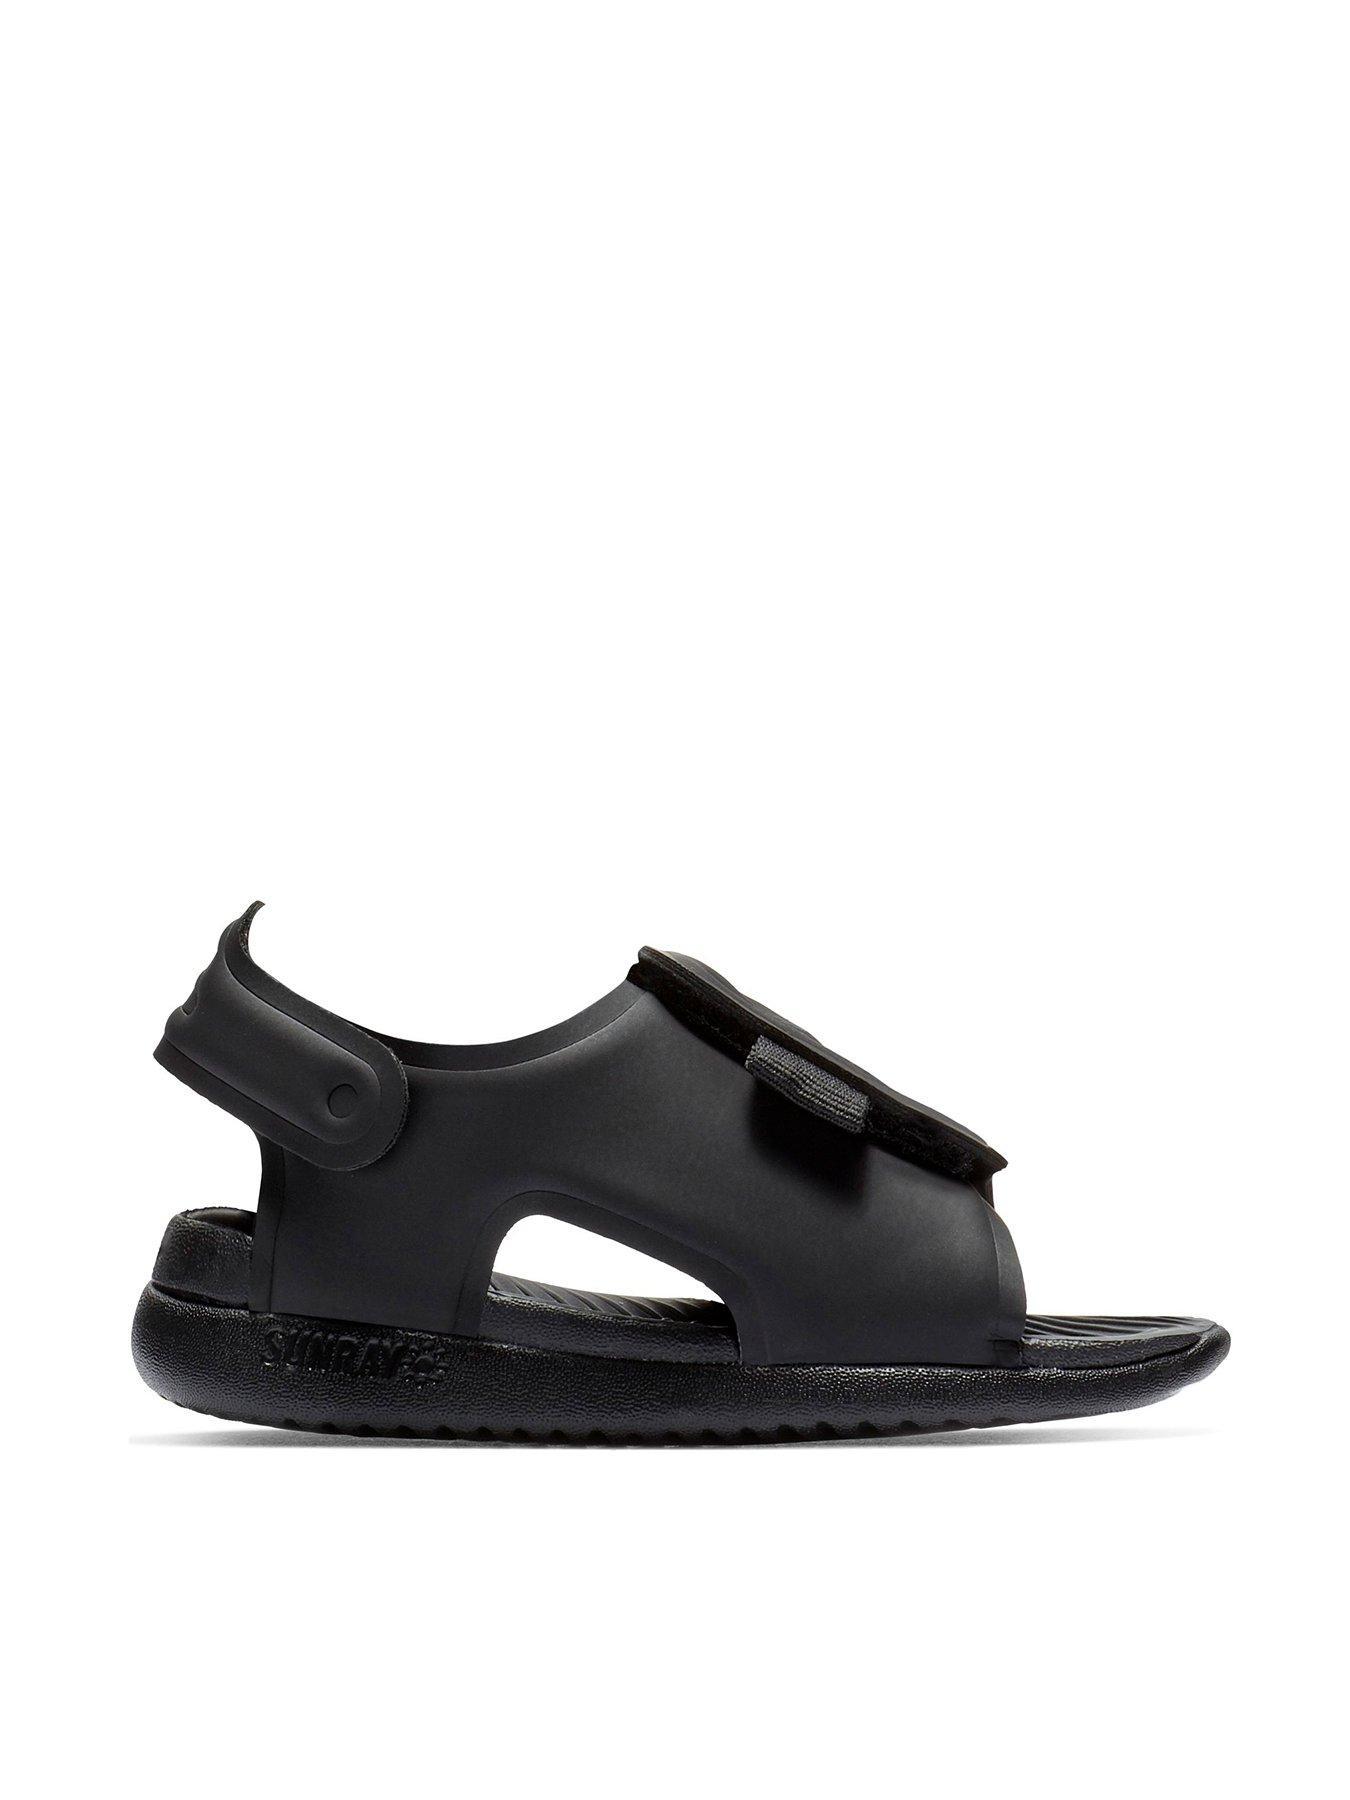 Umqpszv Flopsshoes Www Baby Sandalsamp; Nike Flip Boots Child n0NwOvm8